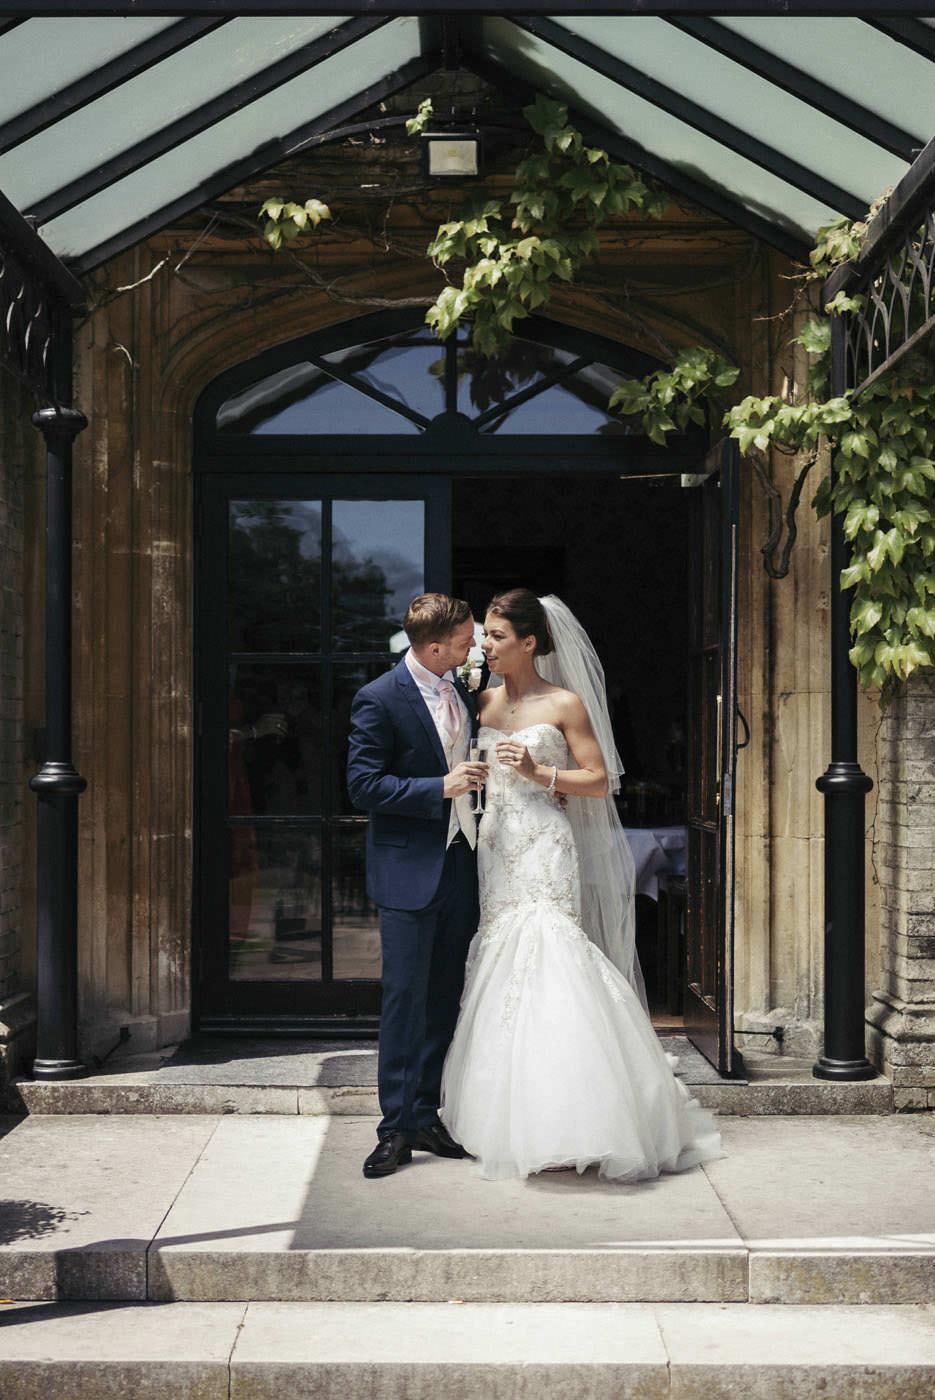 lukeemily foxhills wedding photographer 0057